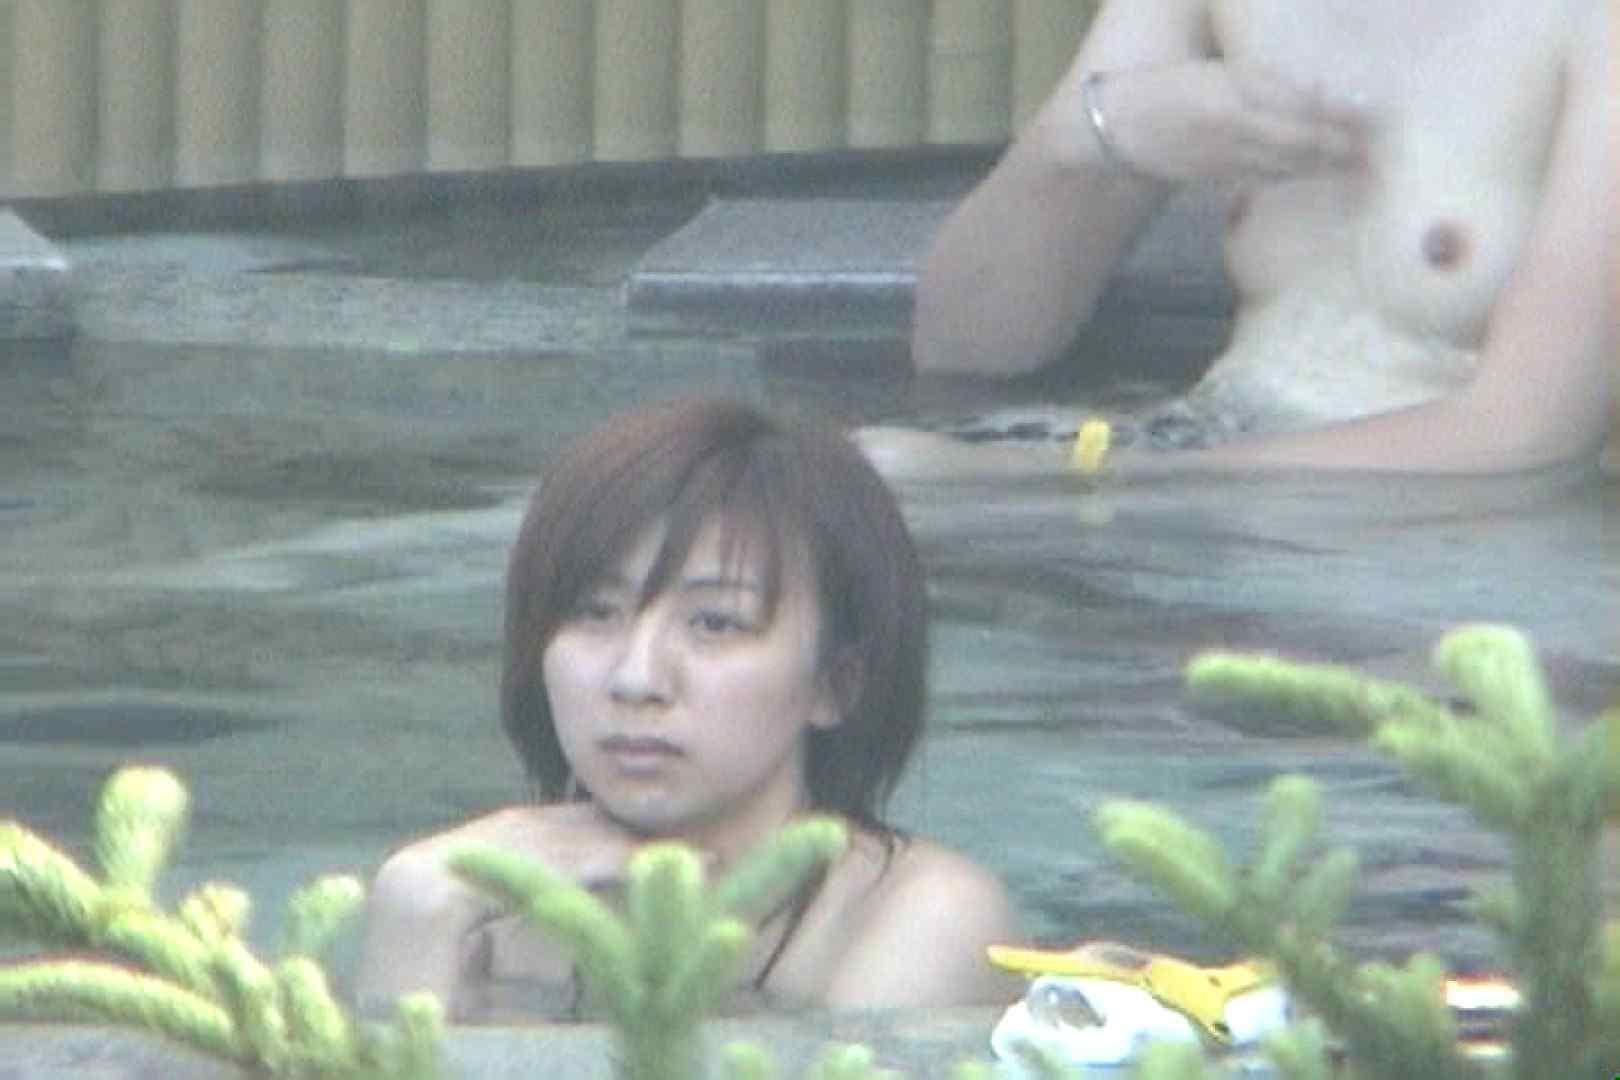 Aquaな露天風呂Vol.77【VIP限定】 露天   盗撮特集  98画像 7